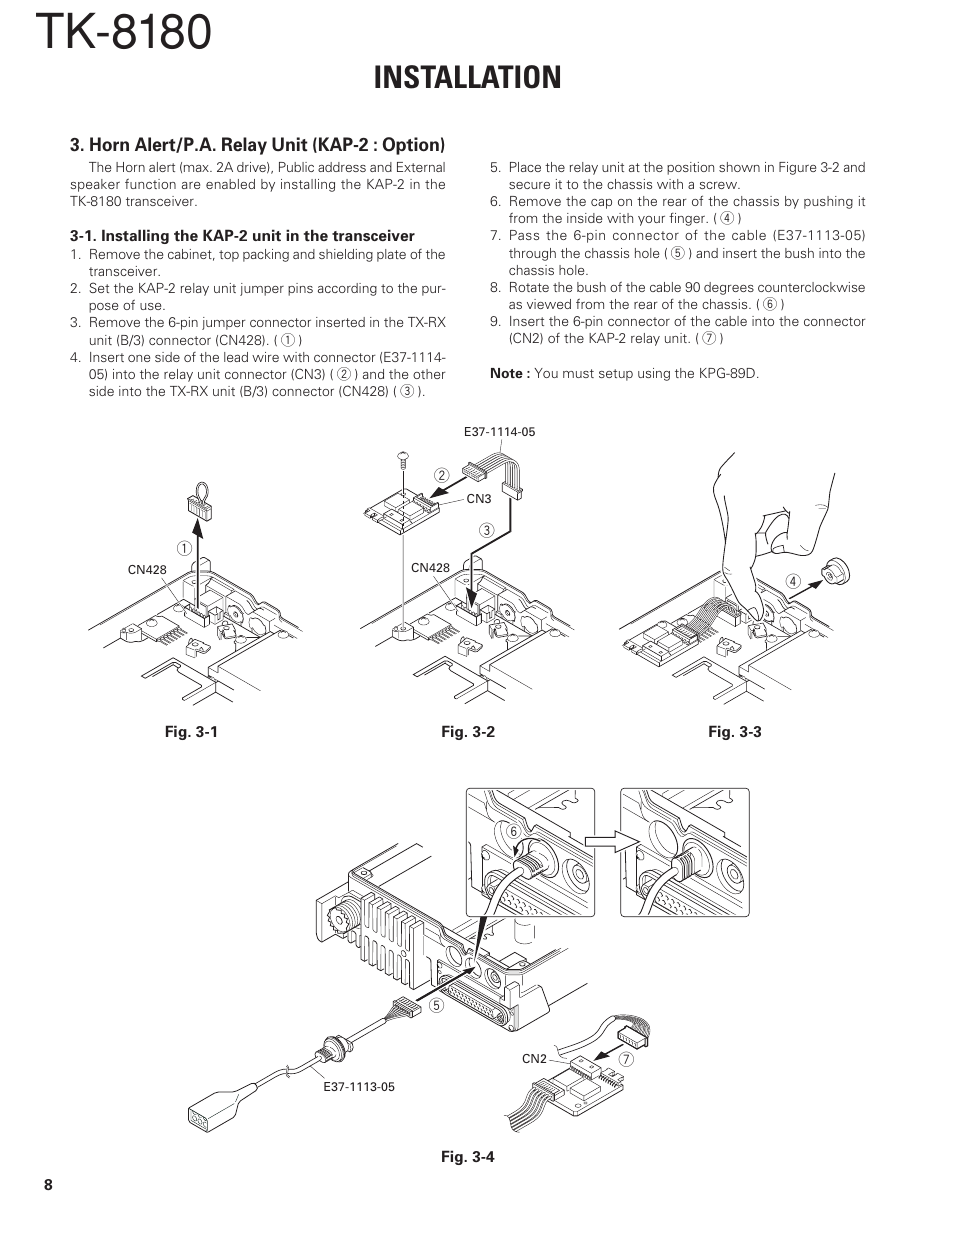 horn alert p a relay unit (kap 2 option), tk 8180, installationhorn alert p a relay unit (kap 2 option), tk 8180, installation kenwood tk 8180 user manual page 8 85